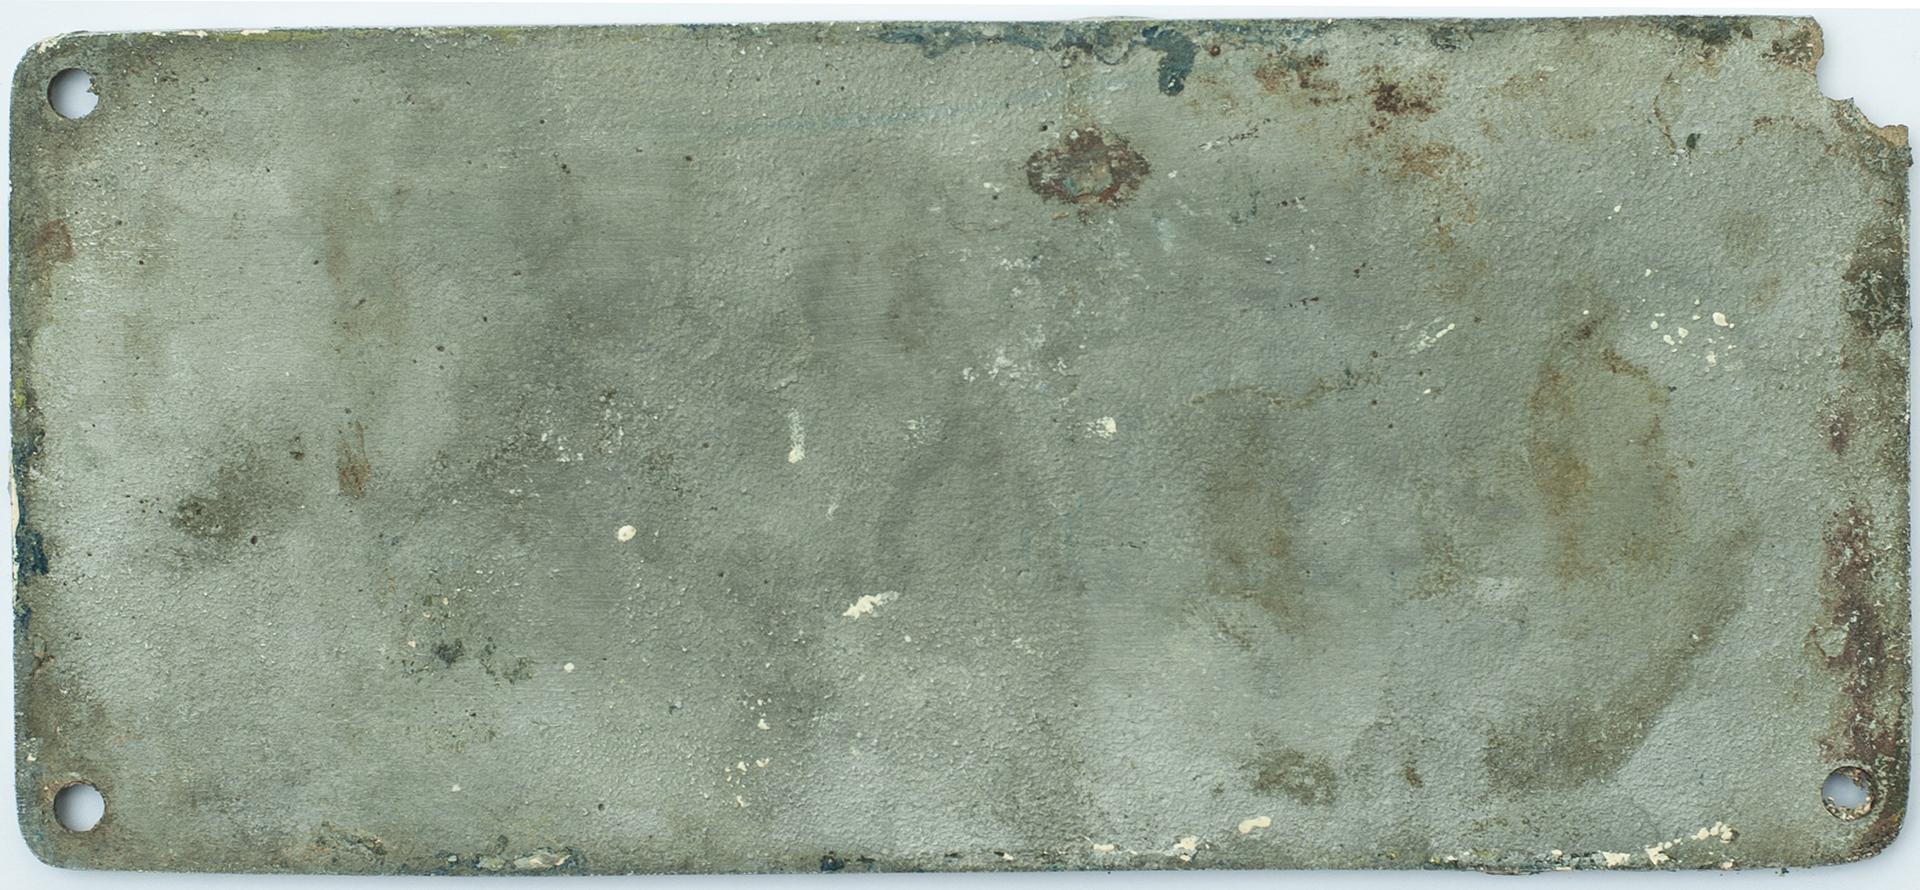 Worksplate THE ENGLISH ELECTRIC CO LTD STEPHENSON WORKS DARLINGTON ENGLAND No 3364/8407 1963 ex - Image 2 of 2